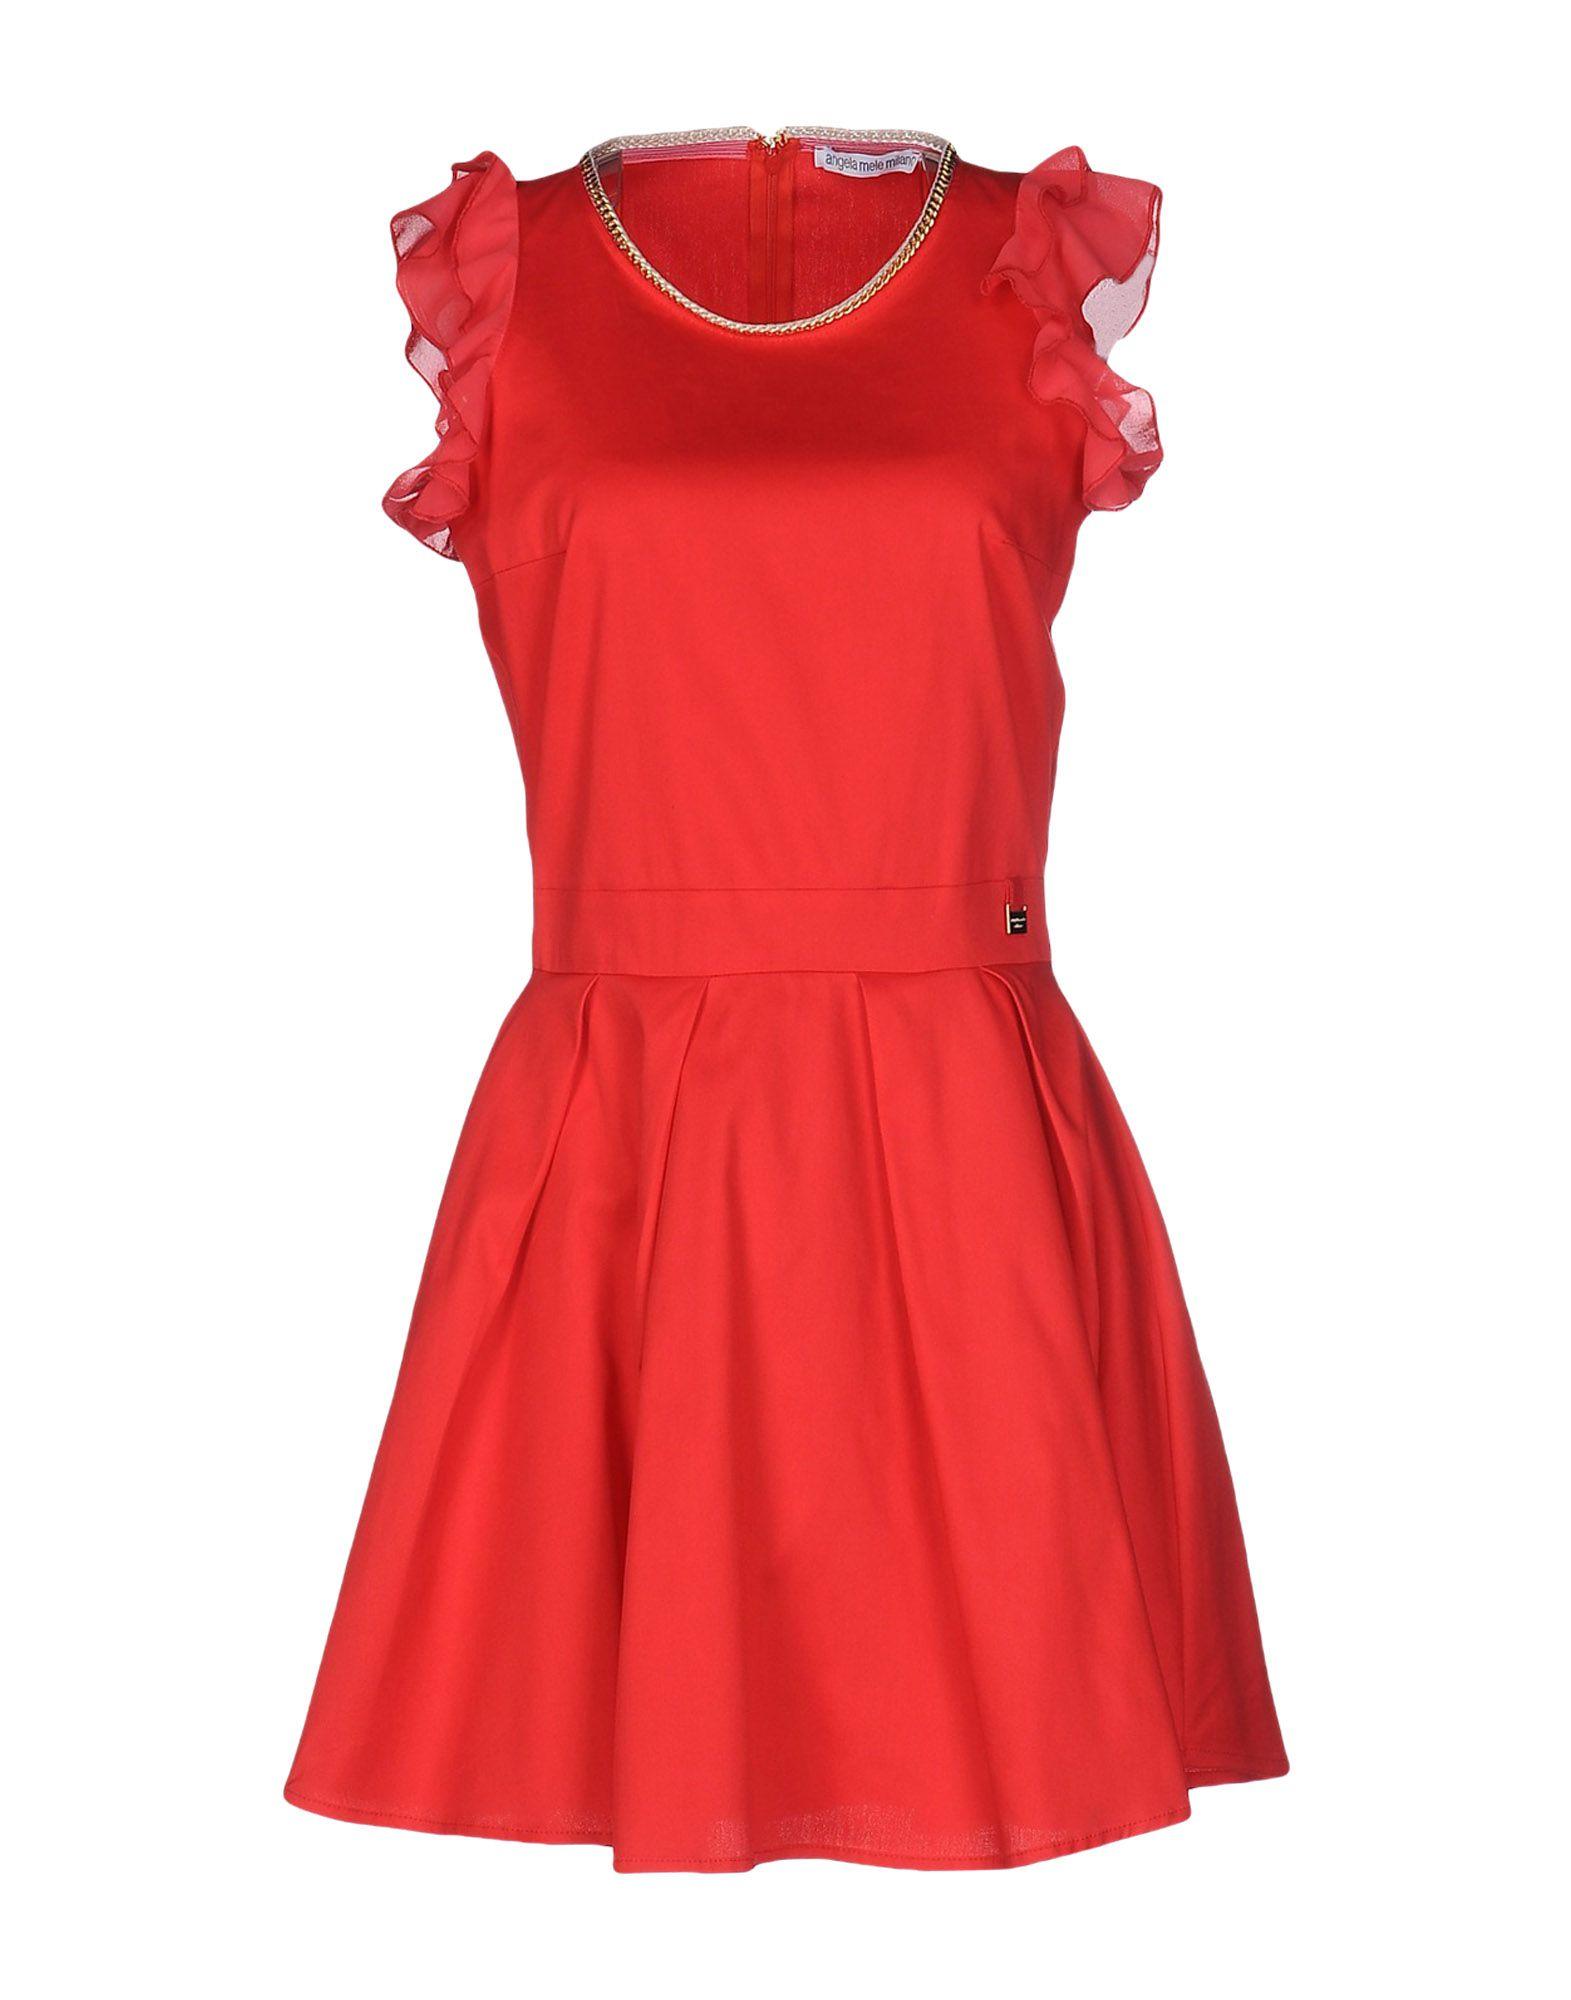 ANGELA MELE MILANO | ANGELA MELE MILANO Short dresses | Goxip